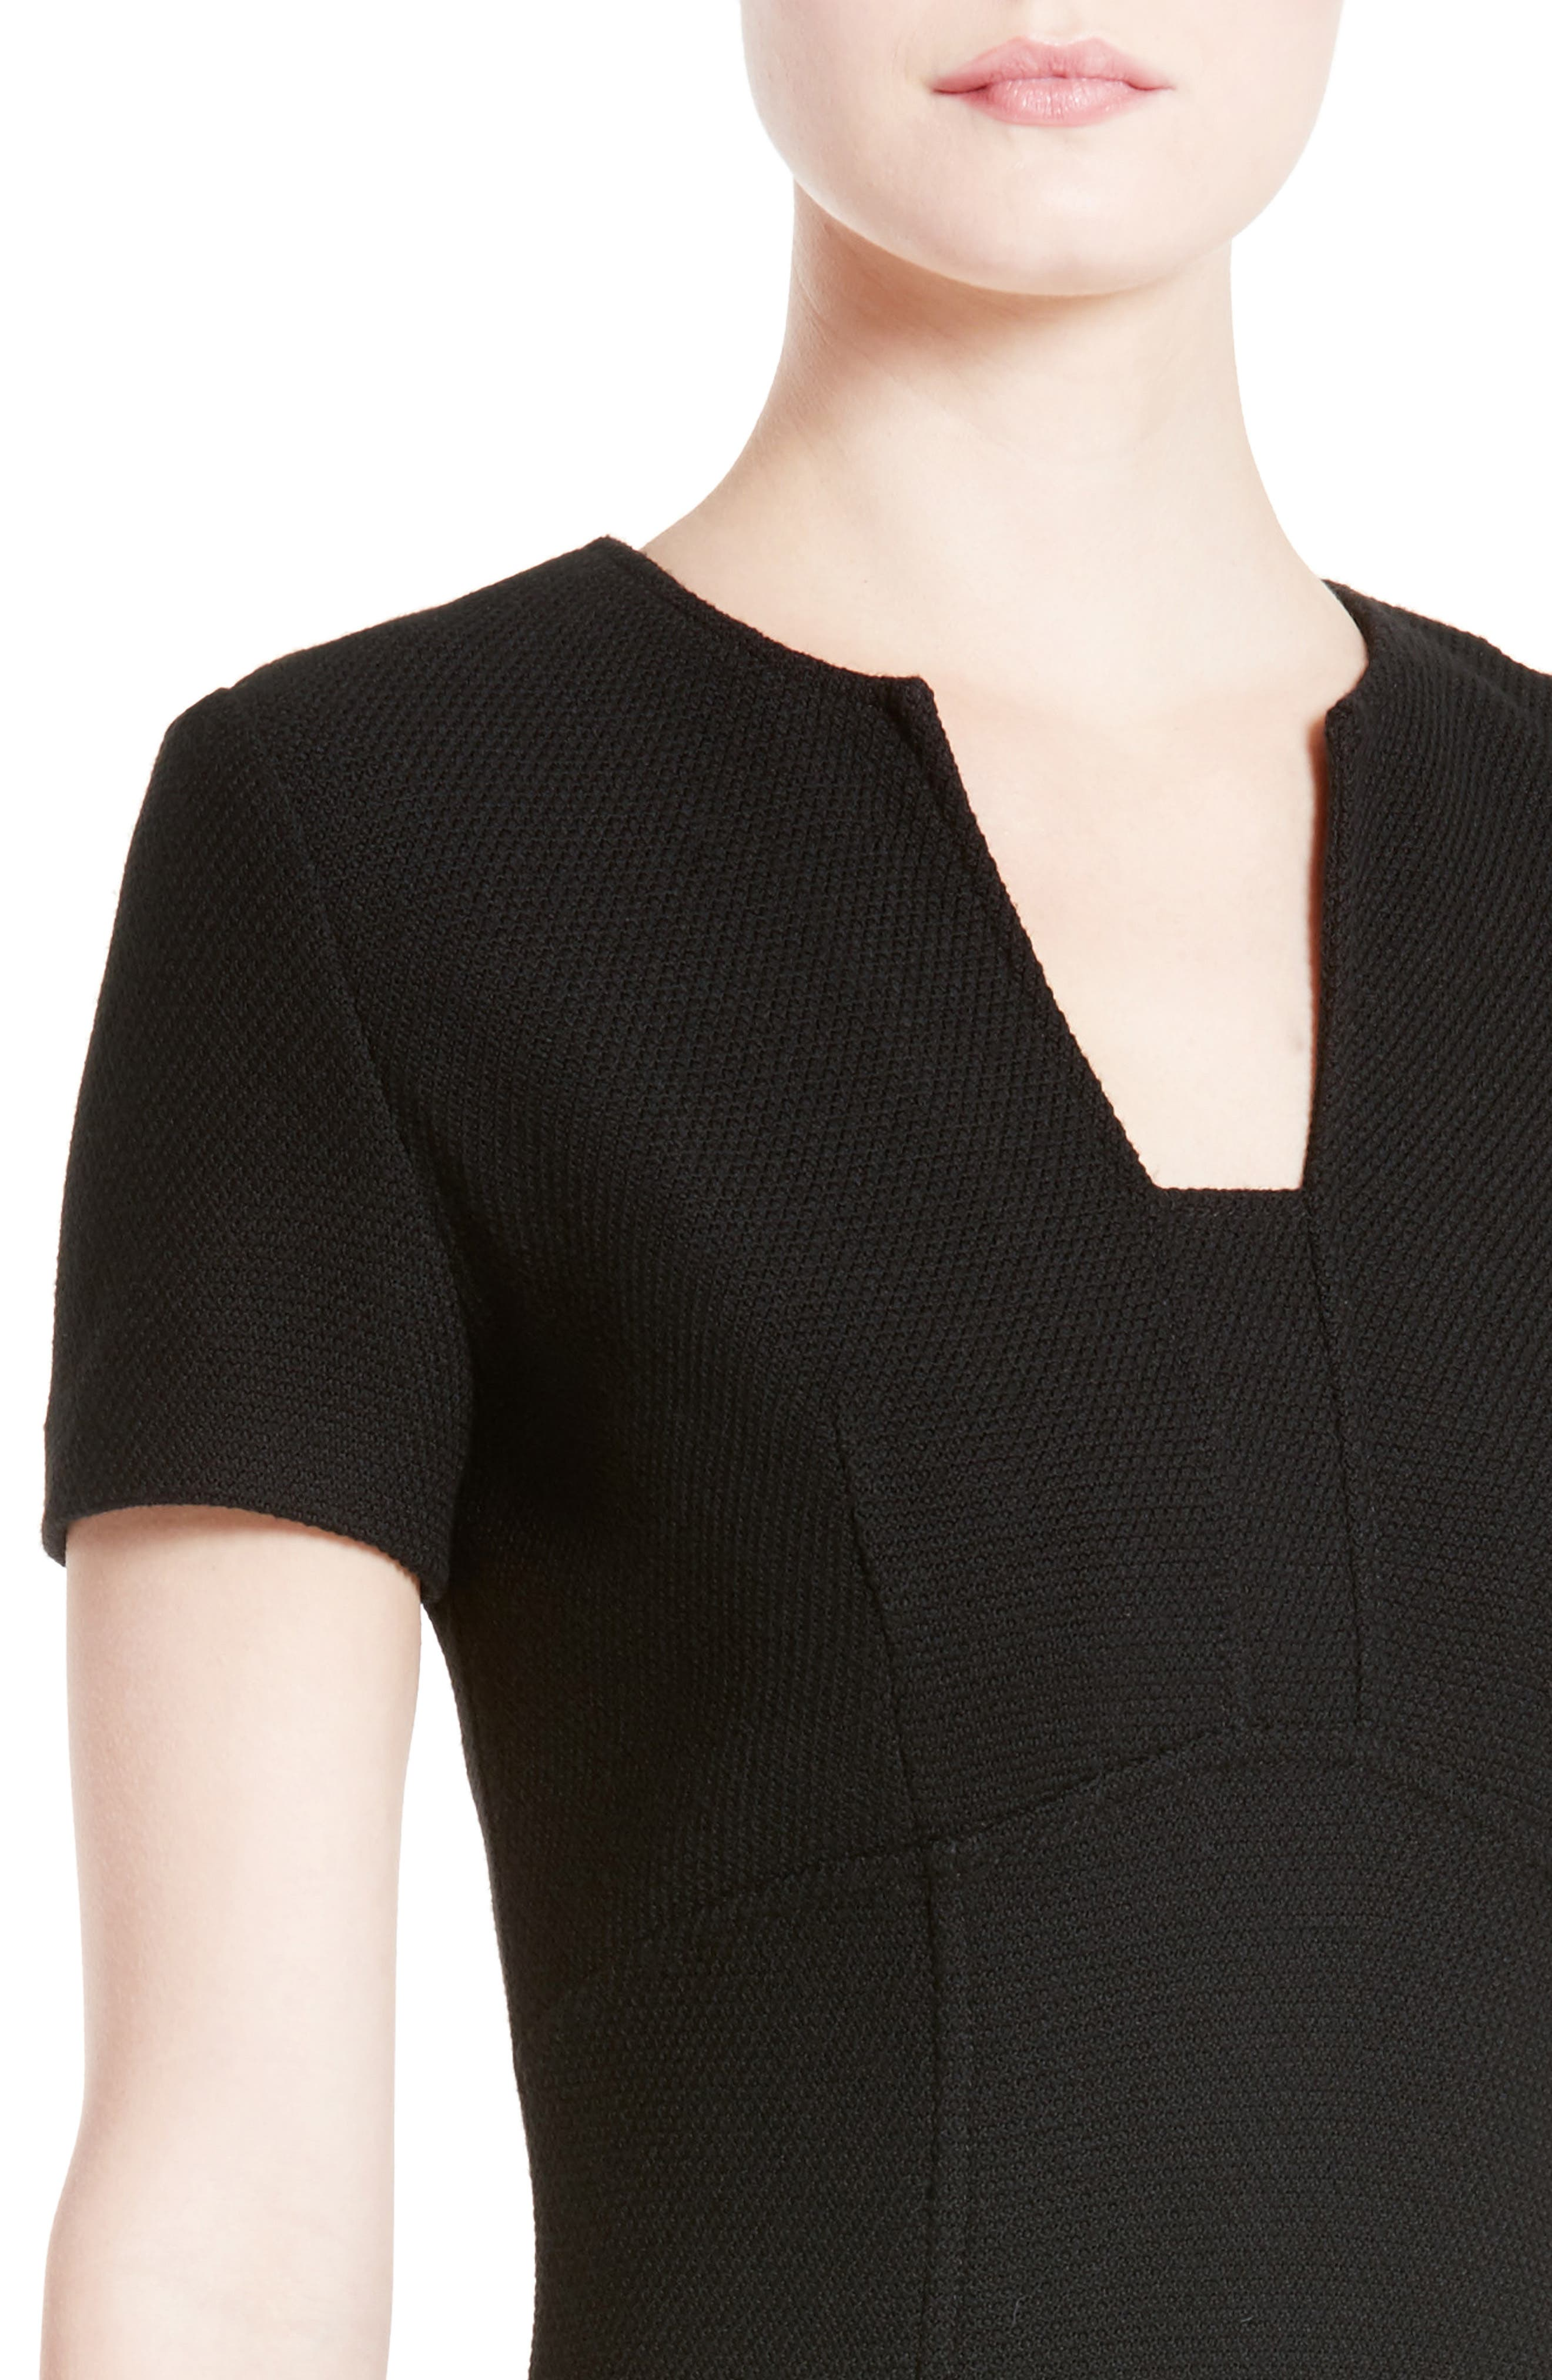 ST. JOHN COLLECTION, Micro Bouclé Knit Dress, Alternate thumbnail 4, color, CAVIAR